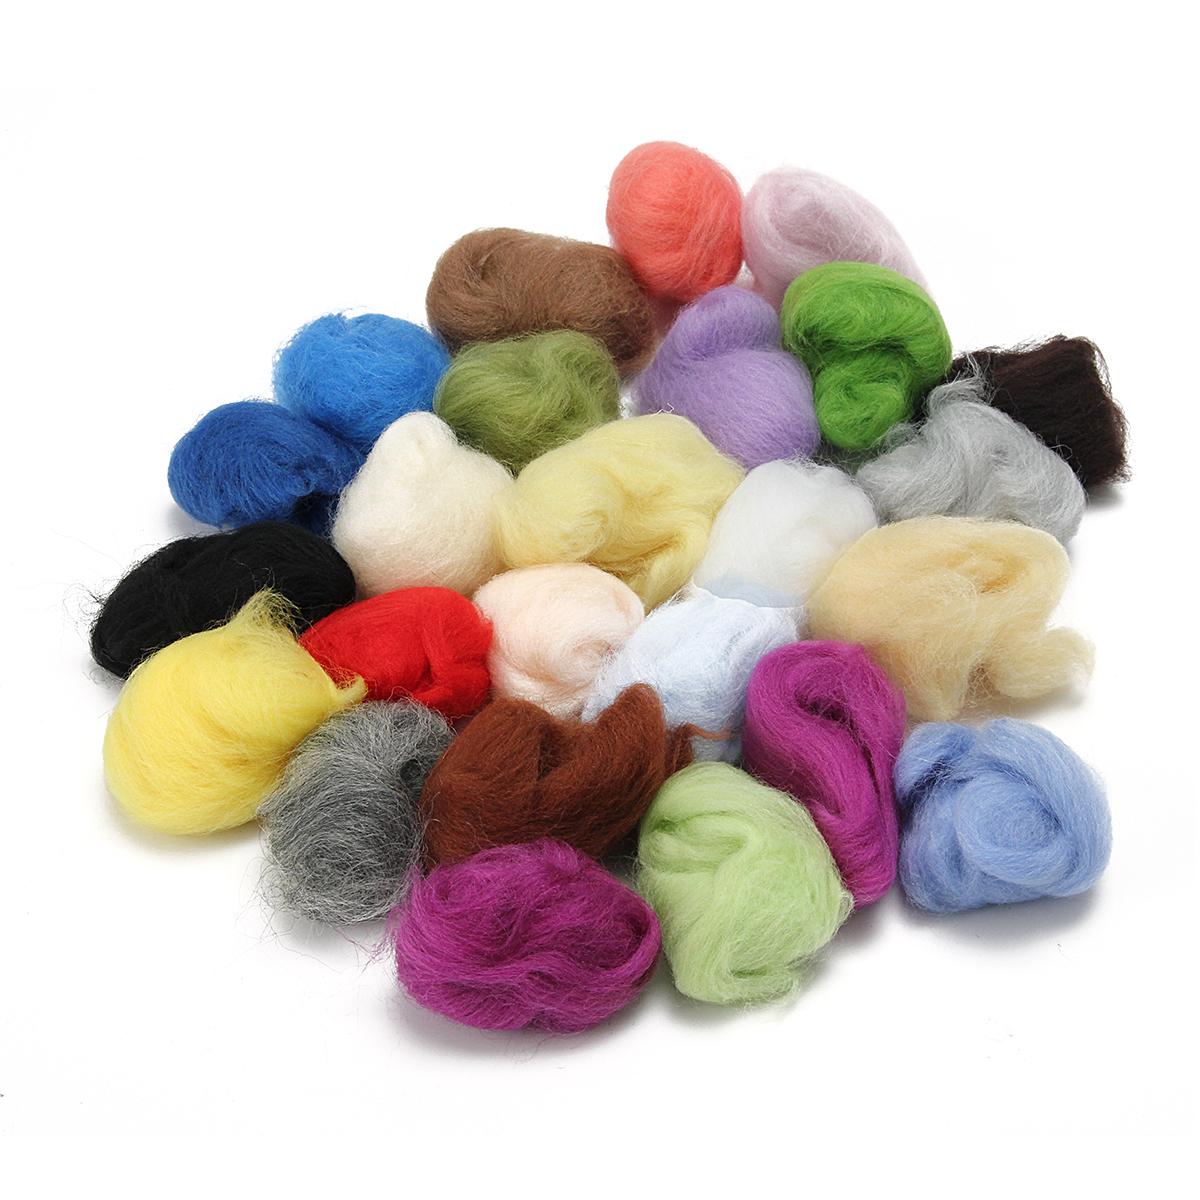 25 Colors Wool Fiber Felting Needle Kits DIY Tools Craft Learner Design Decoration